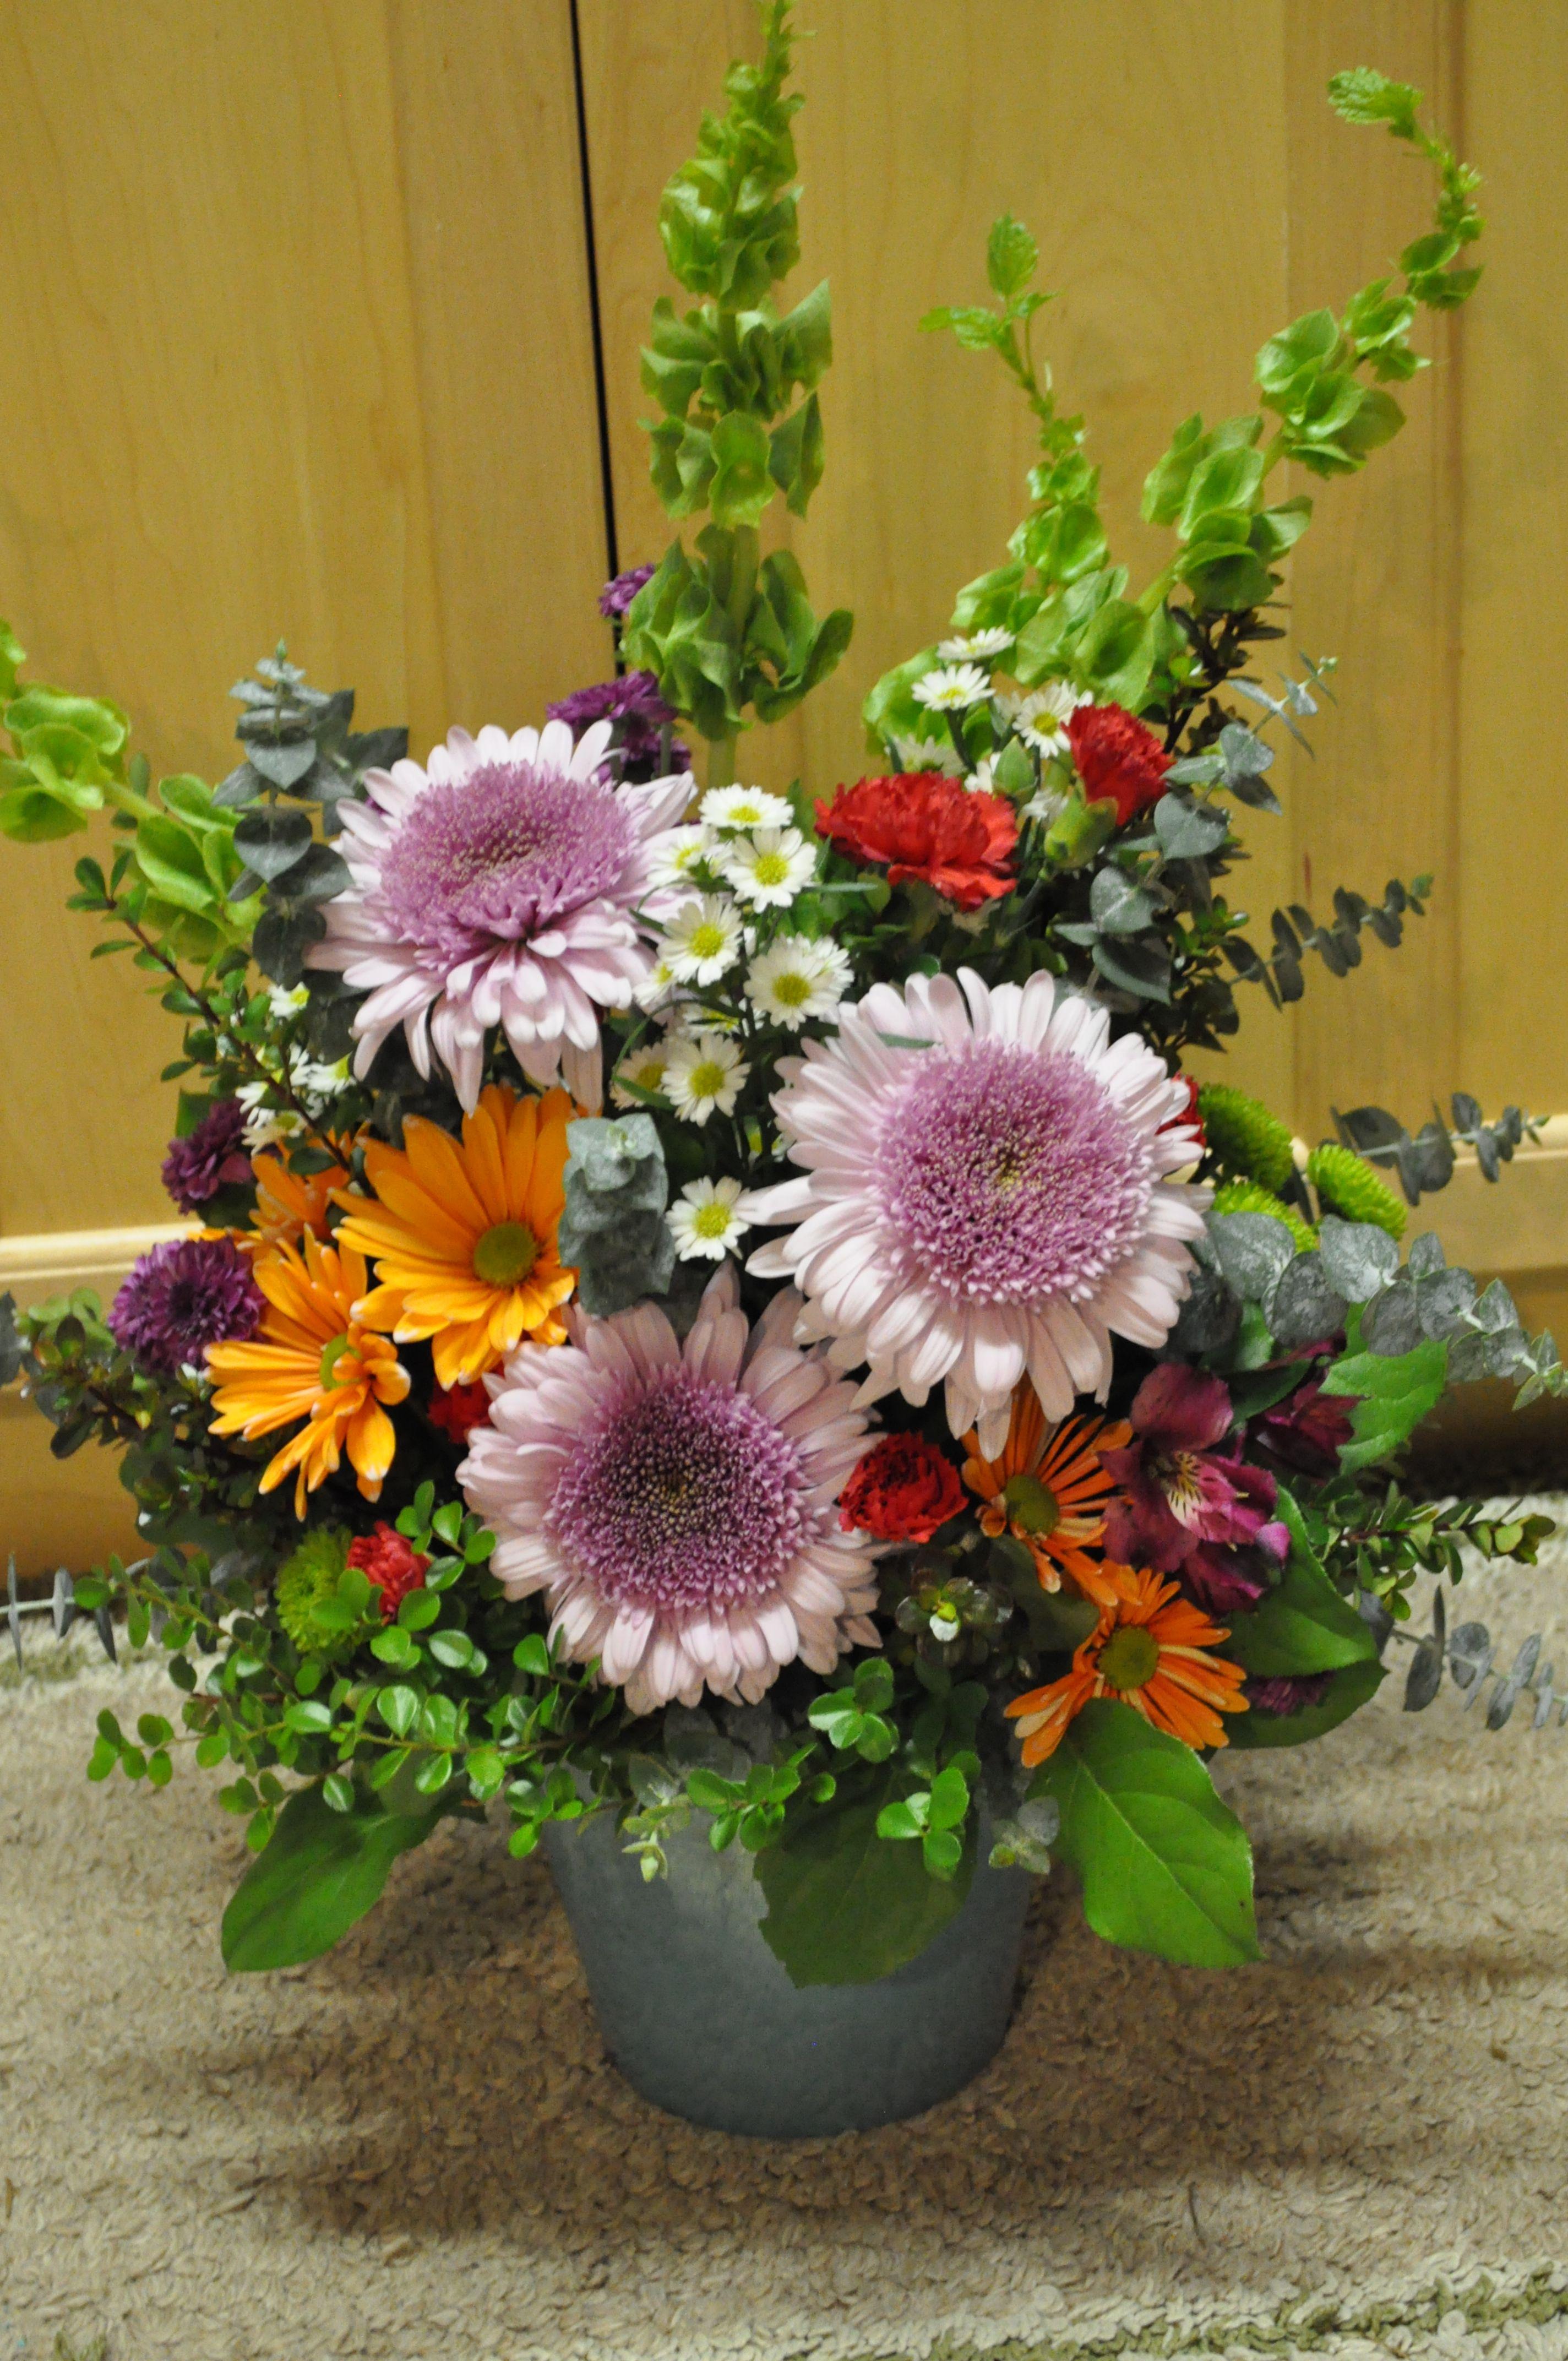 Bells Of Ireland Spider Mum Daisy Pom Carnations Assorted Foliage Flower Arrangements Spider Mums Flowers